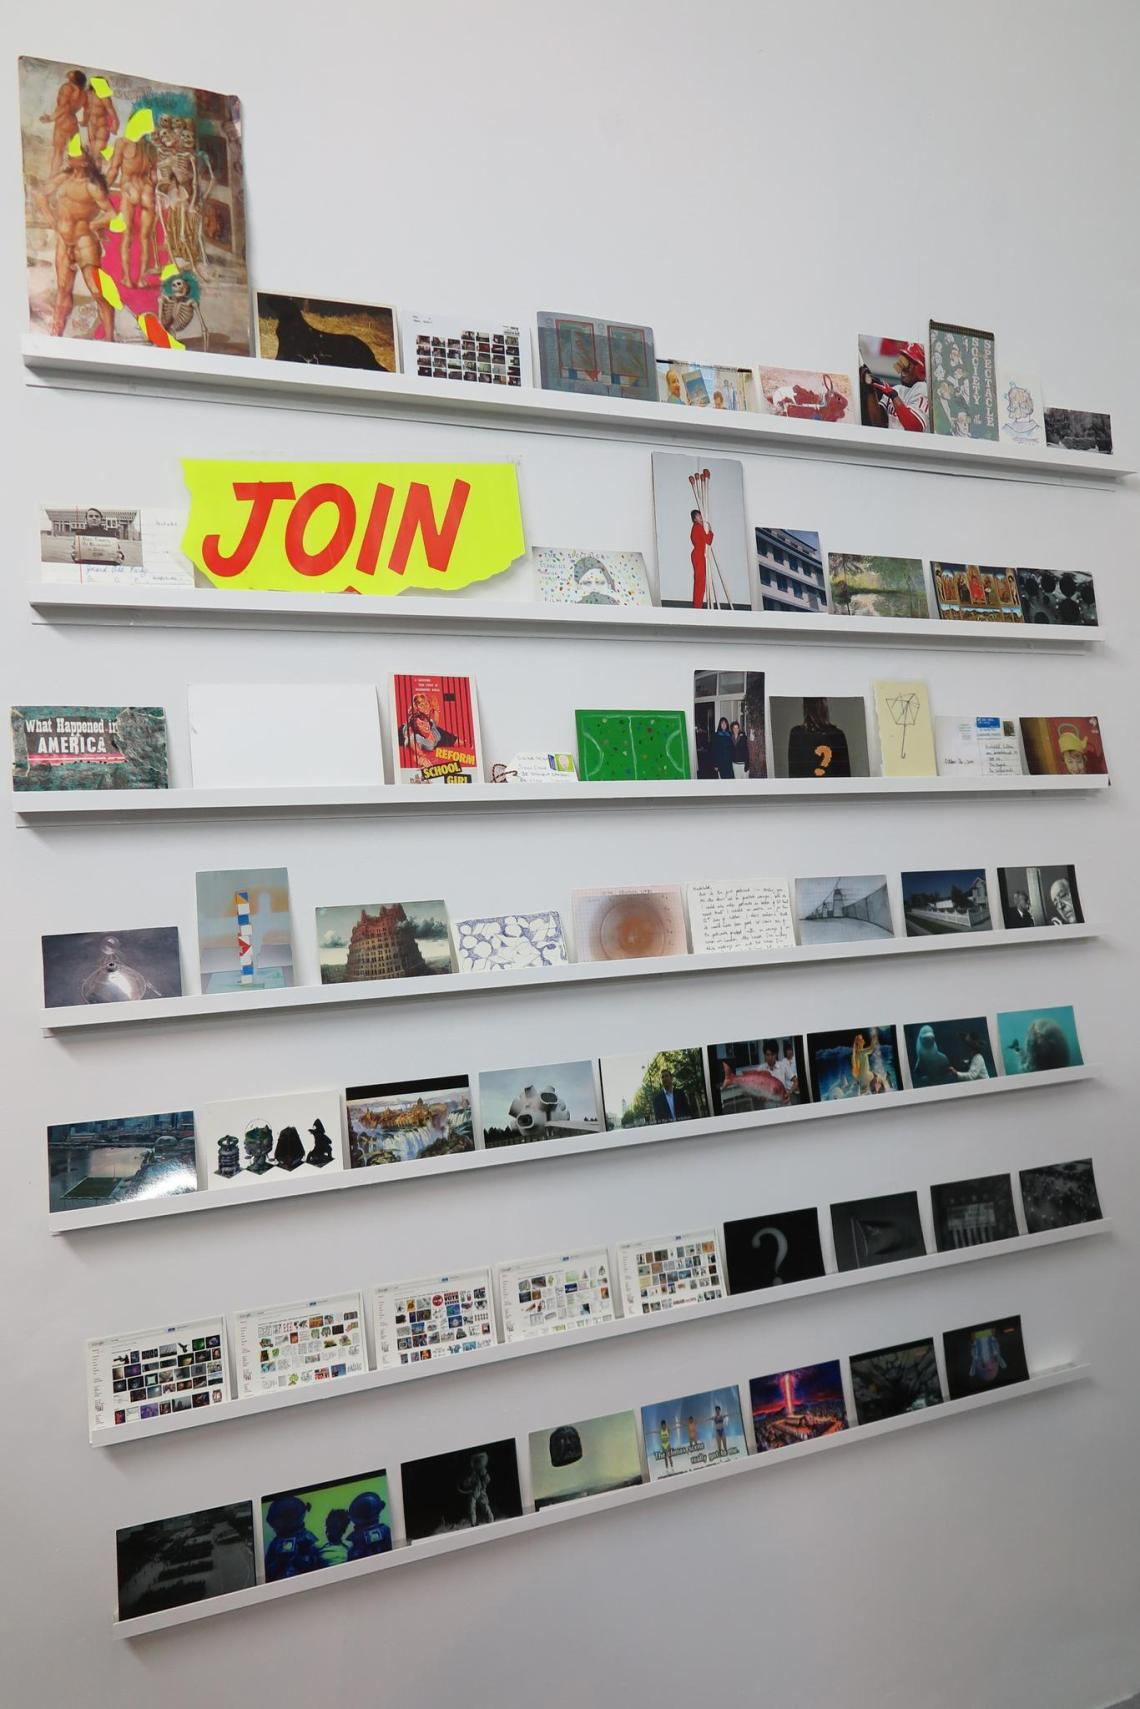 galerie Rianne Groen - Machteld Rullens & Simon Clear